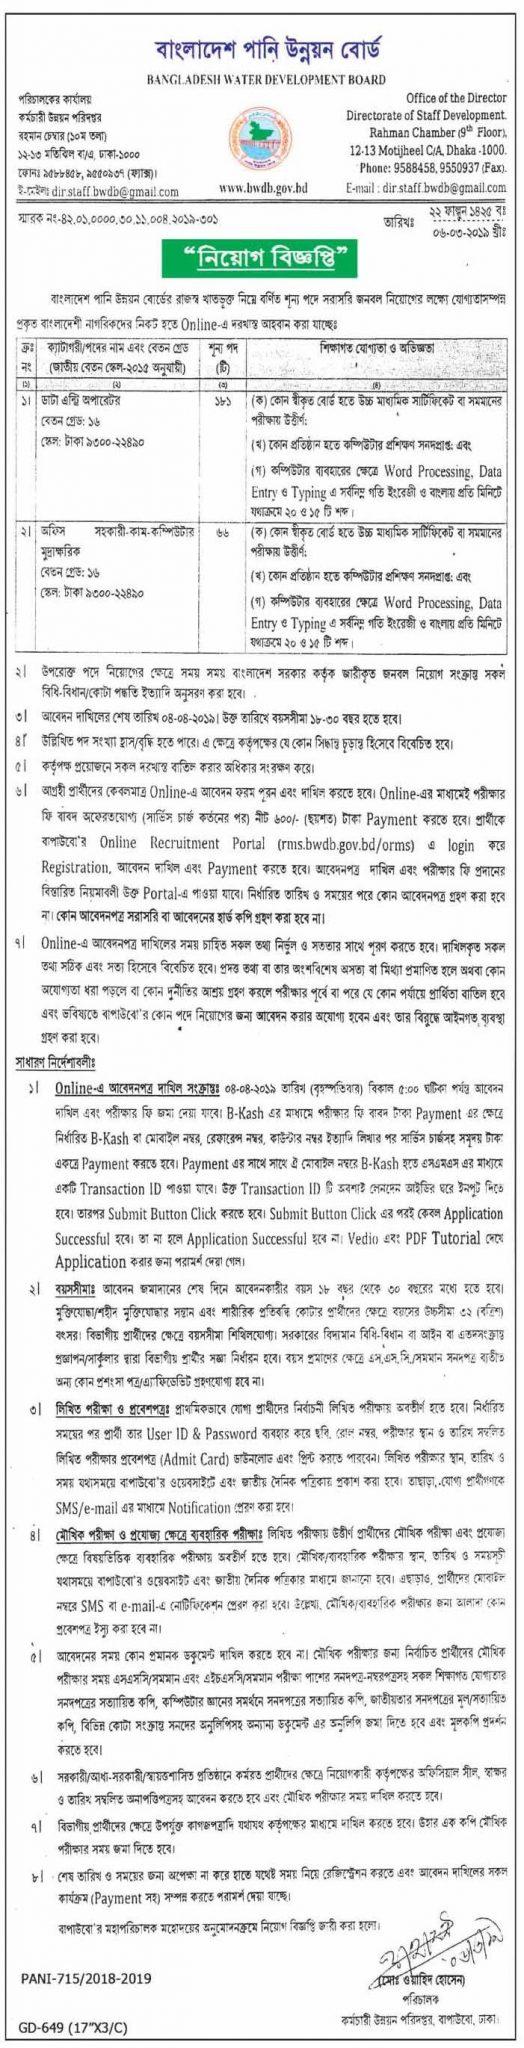 Bangladesh Water Development Board (BWDB) Job Circular 2019